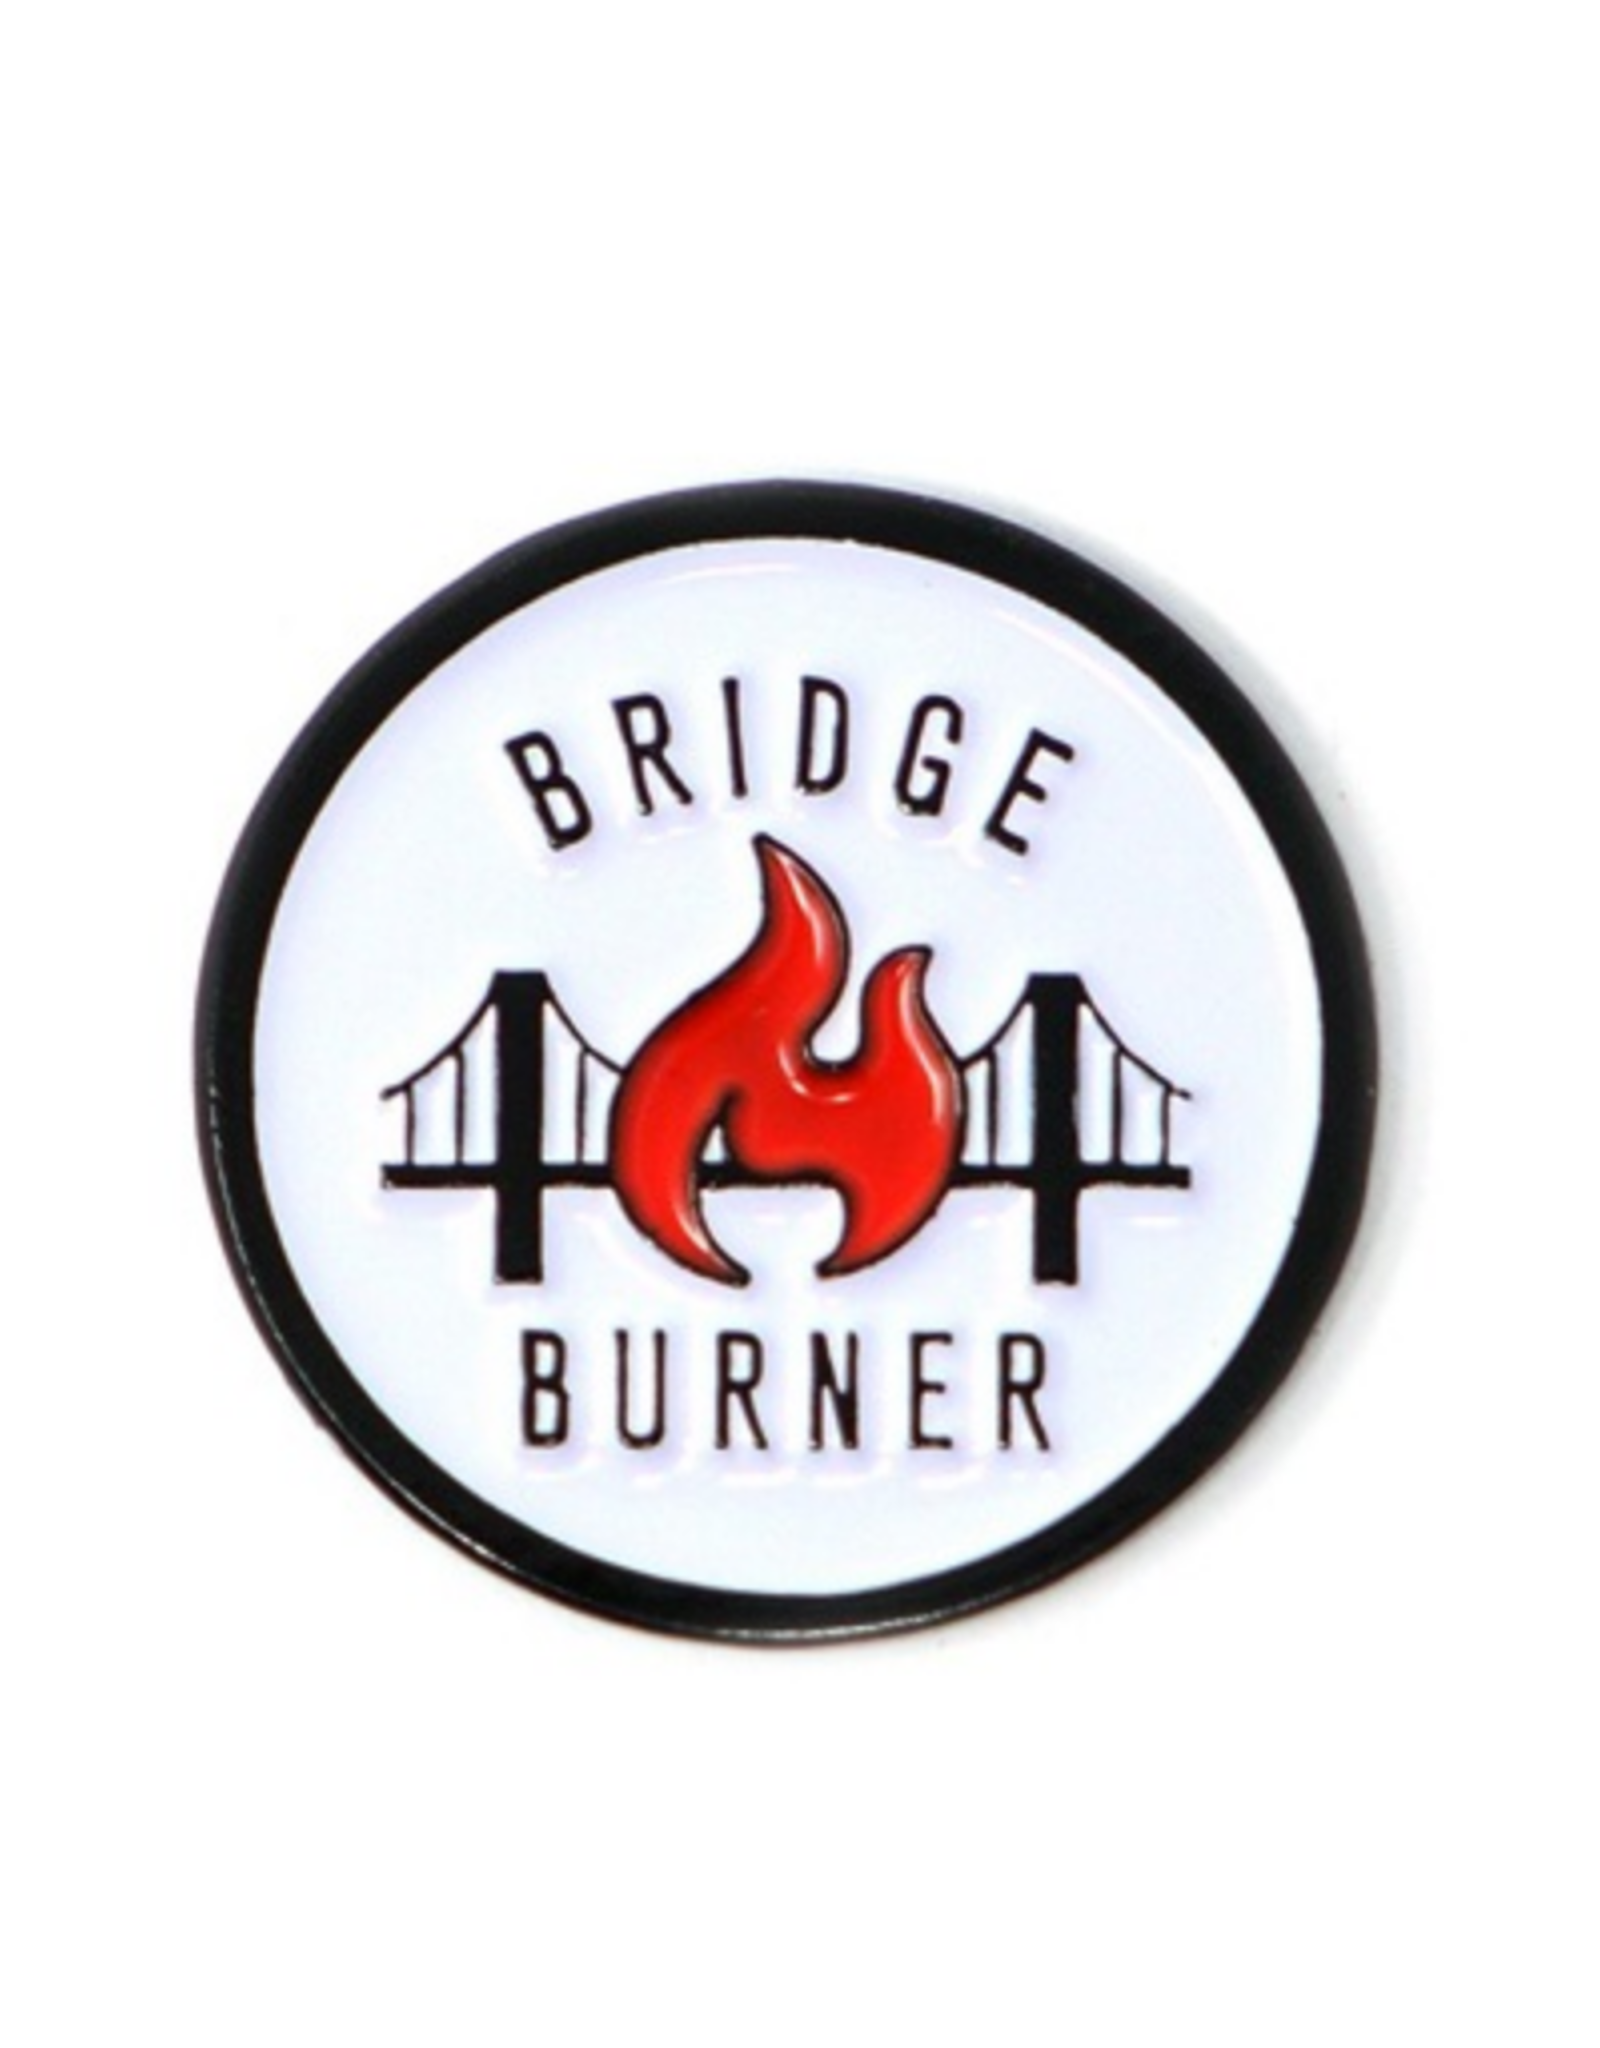 Bridge Burner Enamel Pin